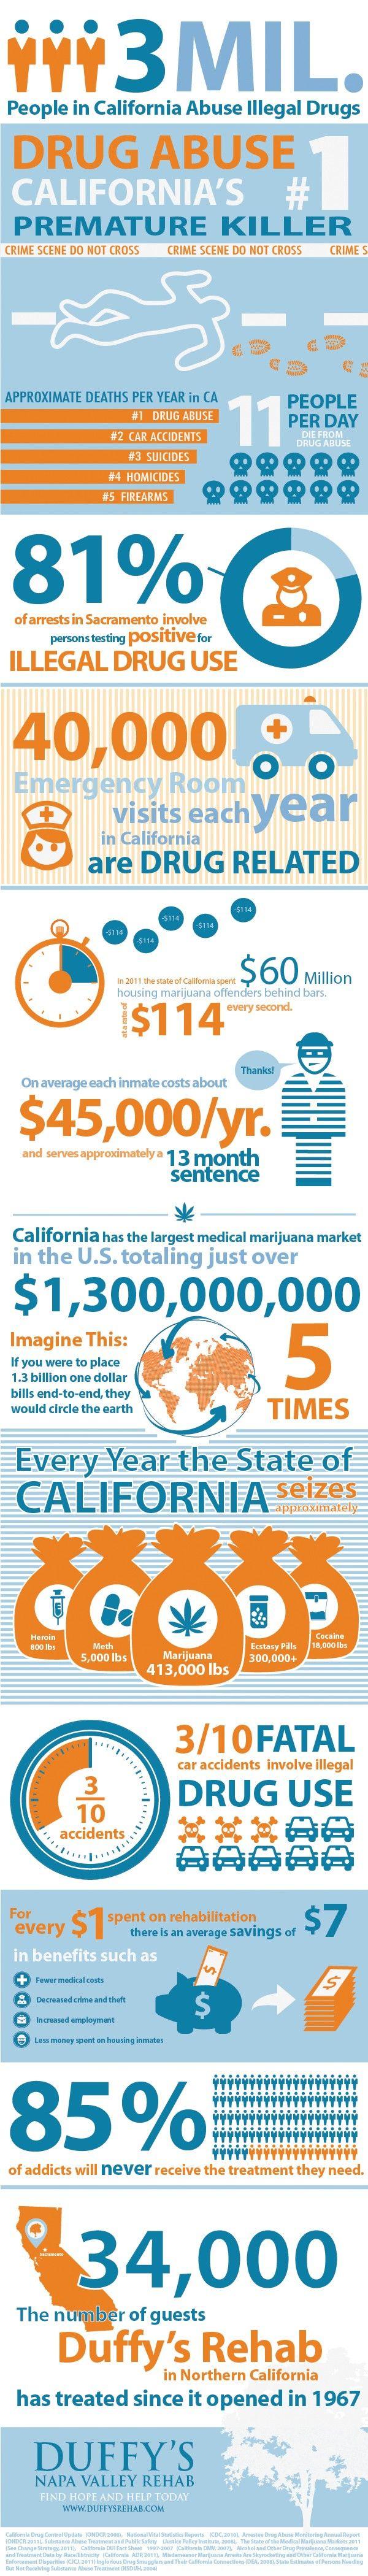 California Drug Abuse Statistics